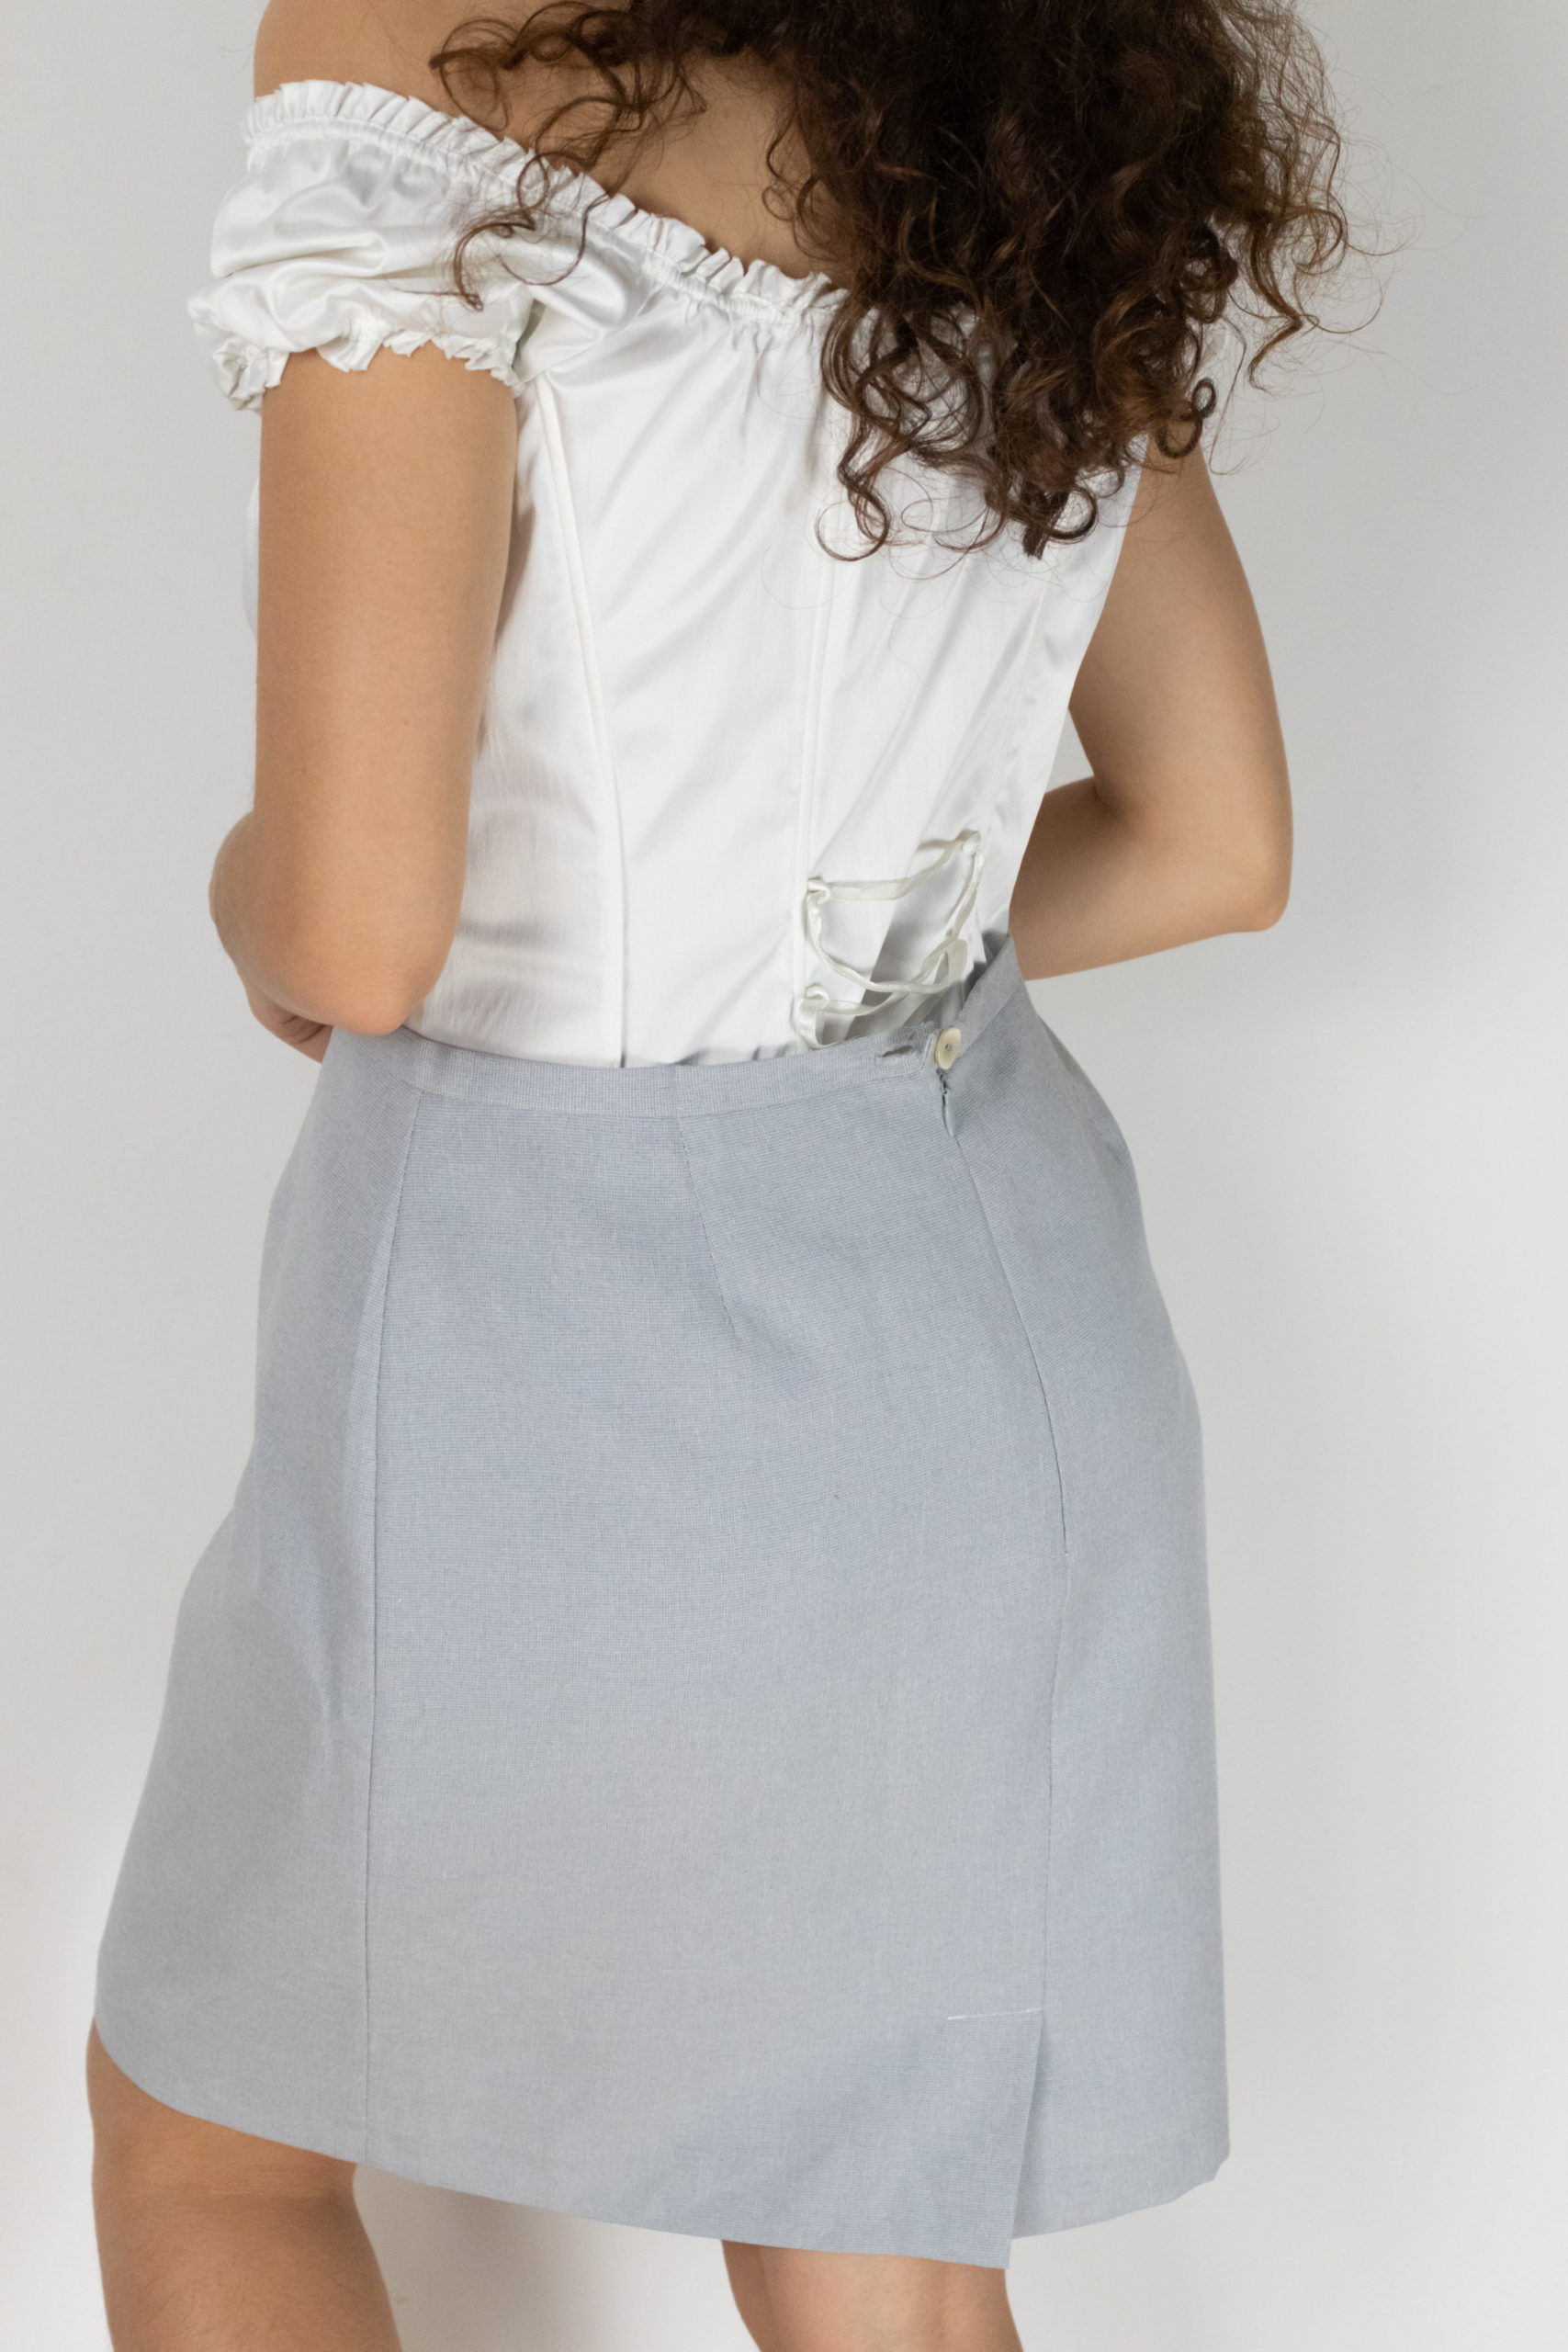 jupe courte bleu pastel (2)